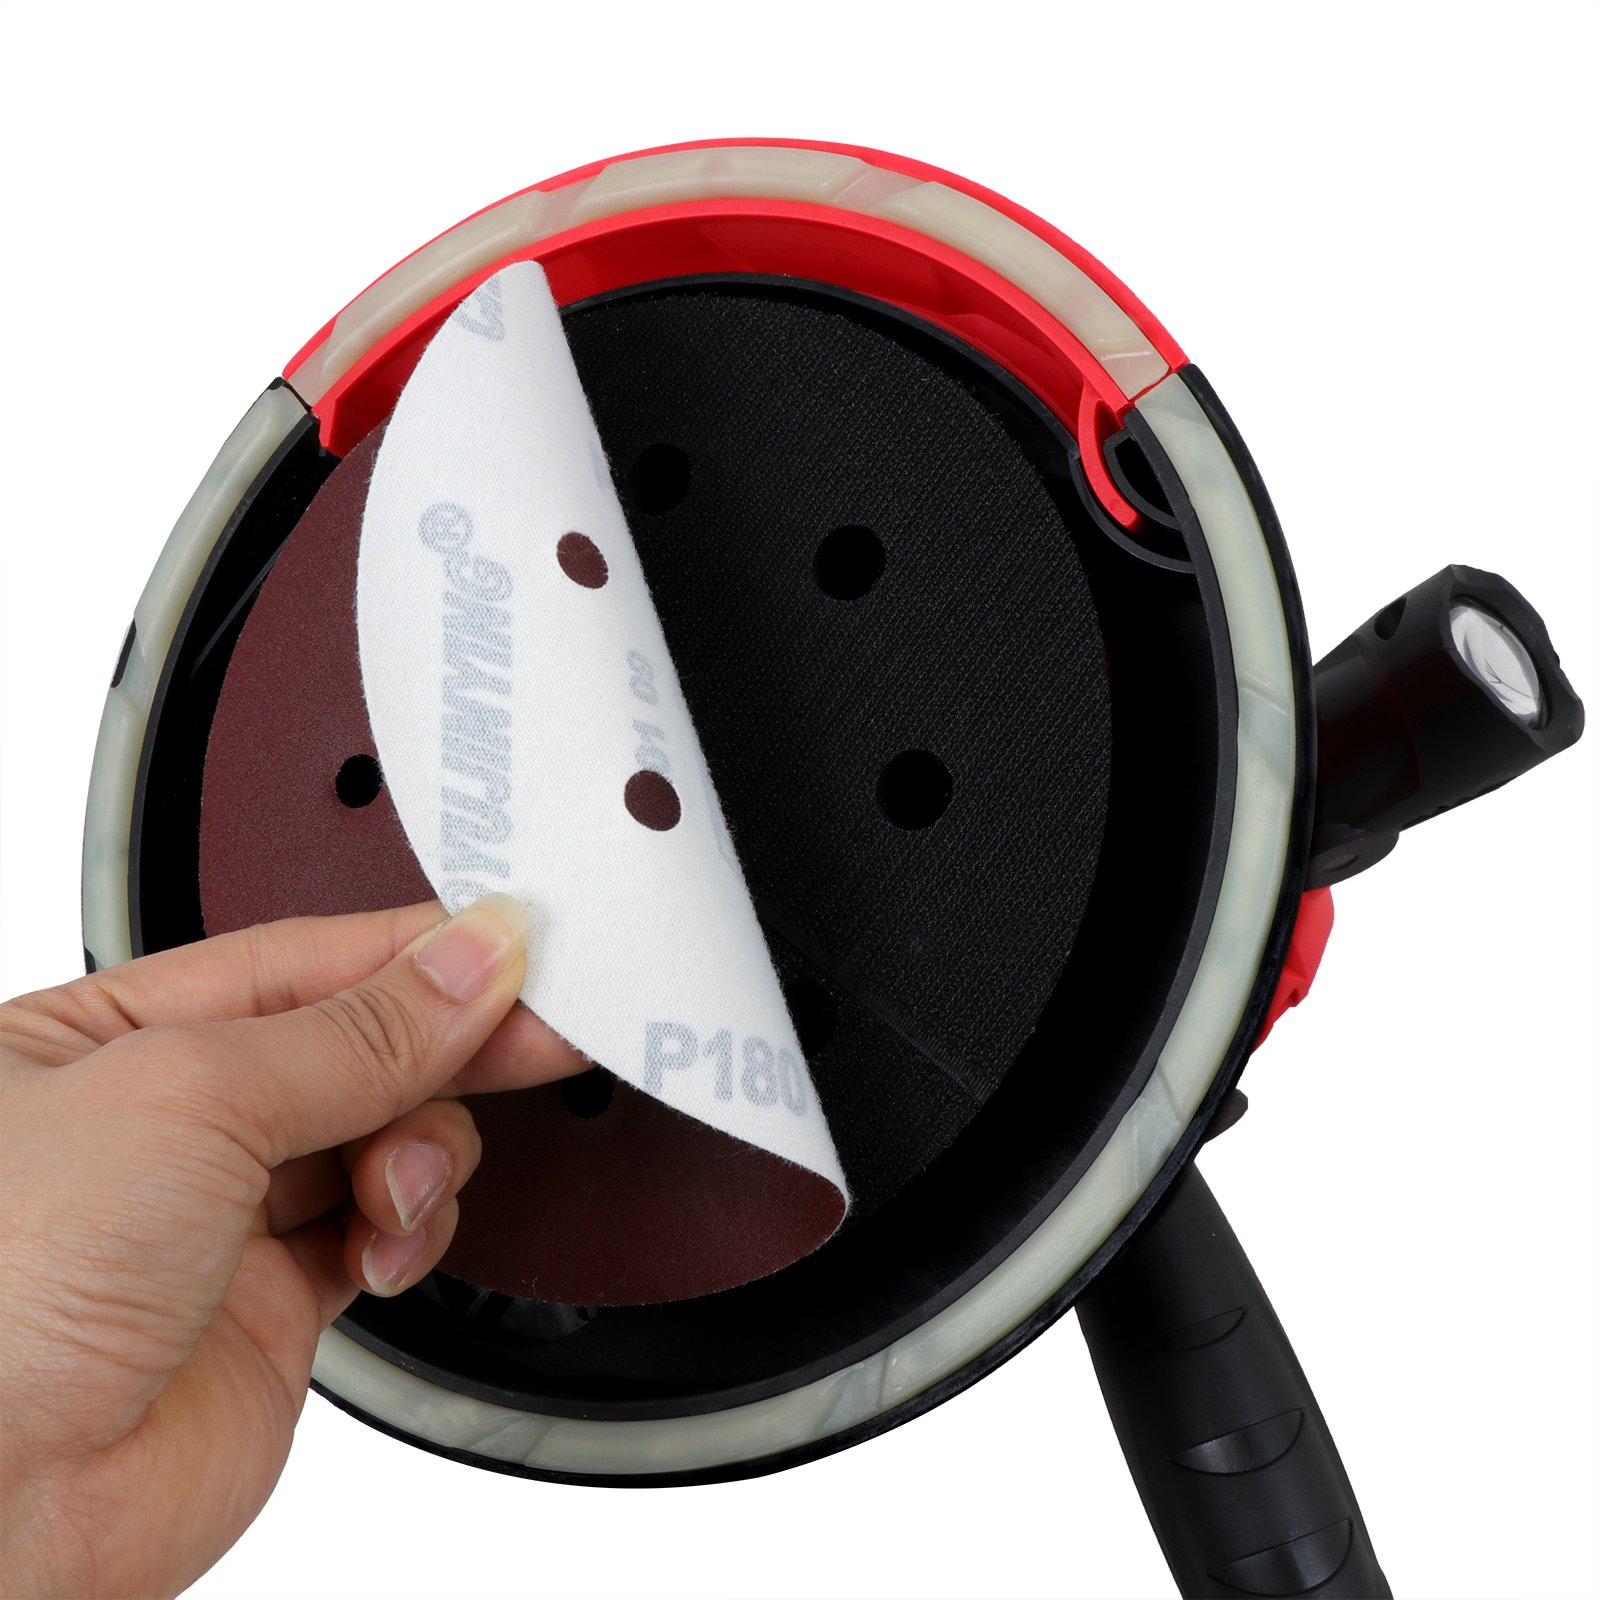 ZENY Electric Handheld Drywall Disc Sander 750W Adjustable Variable Speeds Vacuum Sander w/Sanding Pads & LED Light by ZENY (Image #7)